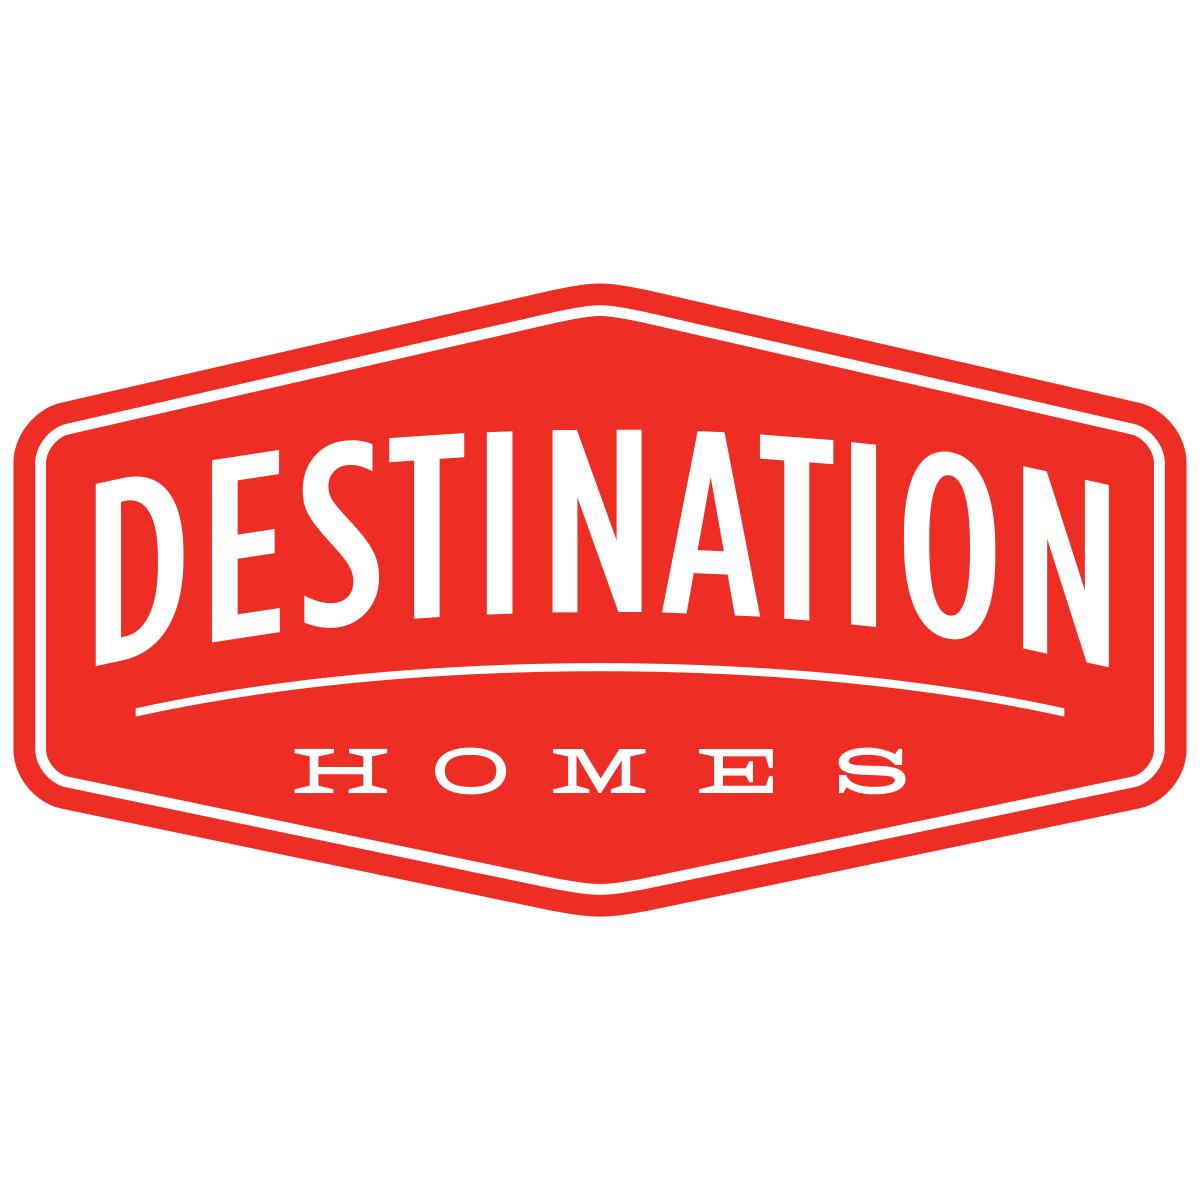 Destination Homes - Layton, UT - Landscape Architects & Design